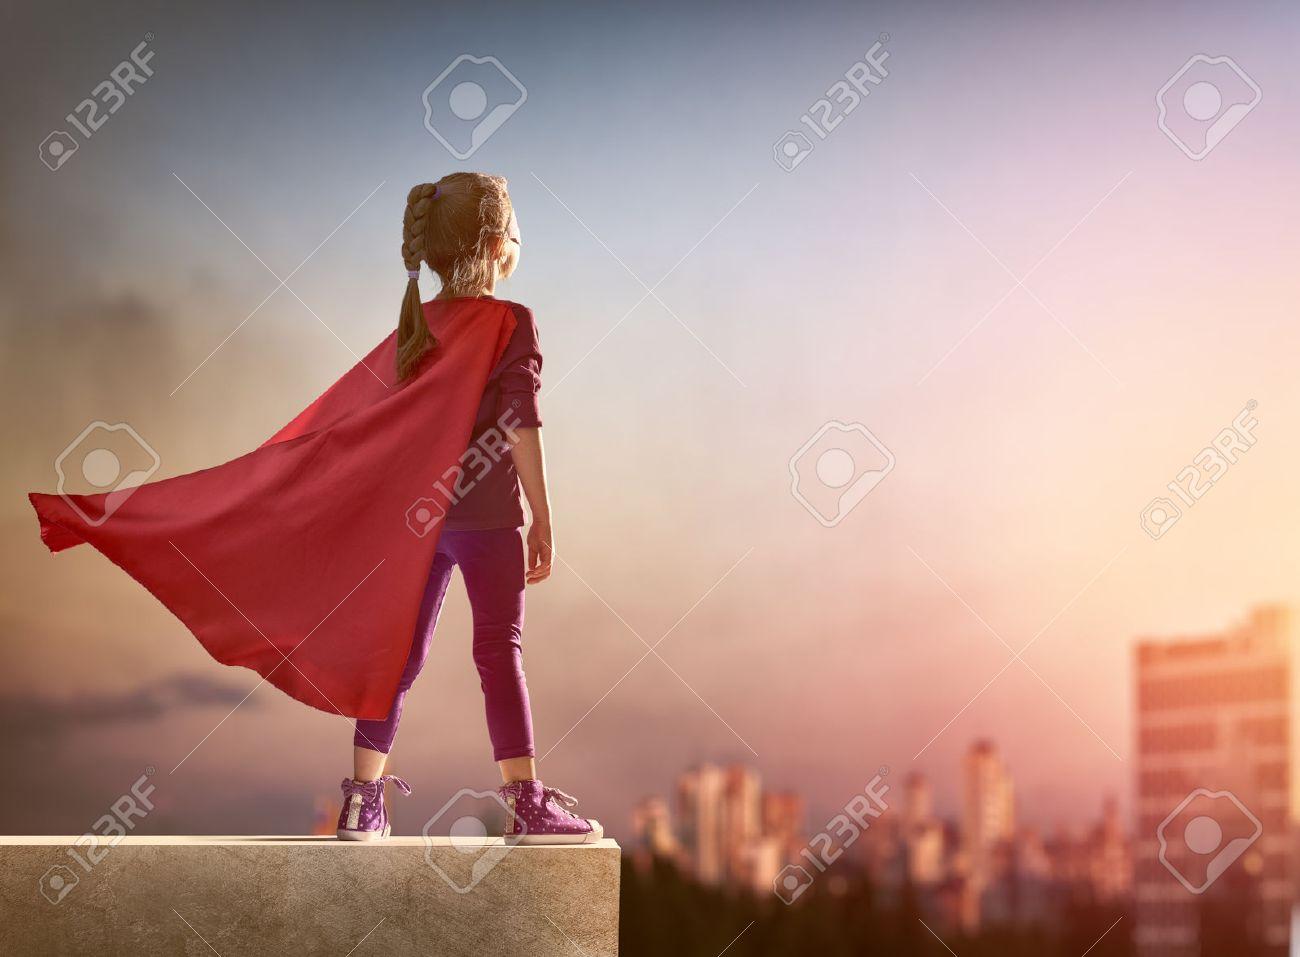 Little child girl plays superhero. Child on the background of sunset sky. Girl power concept - 51236864